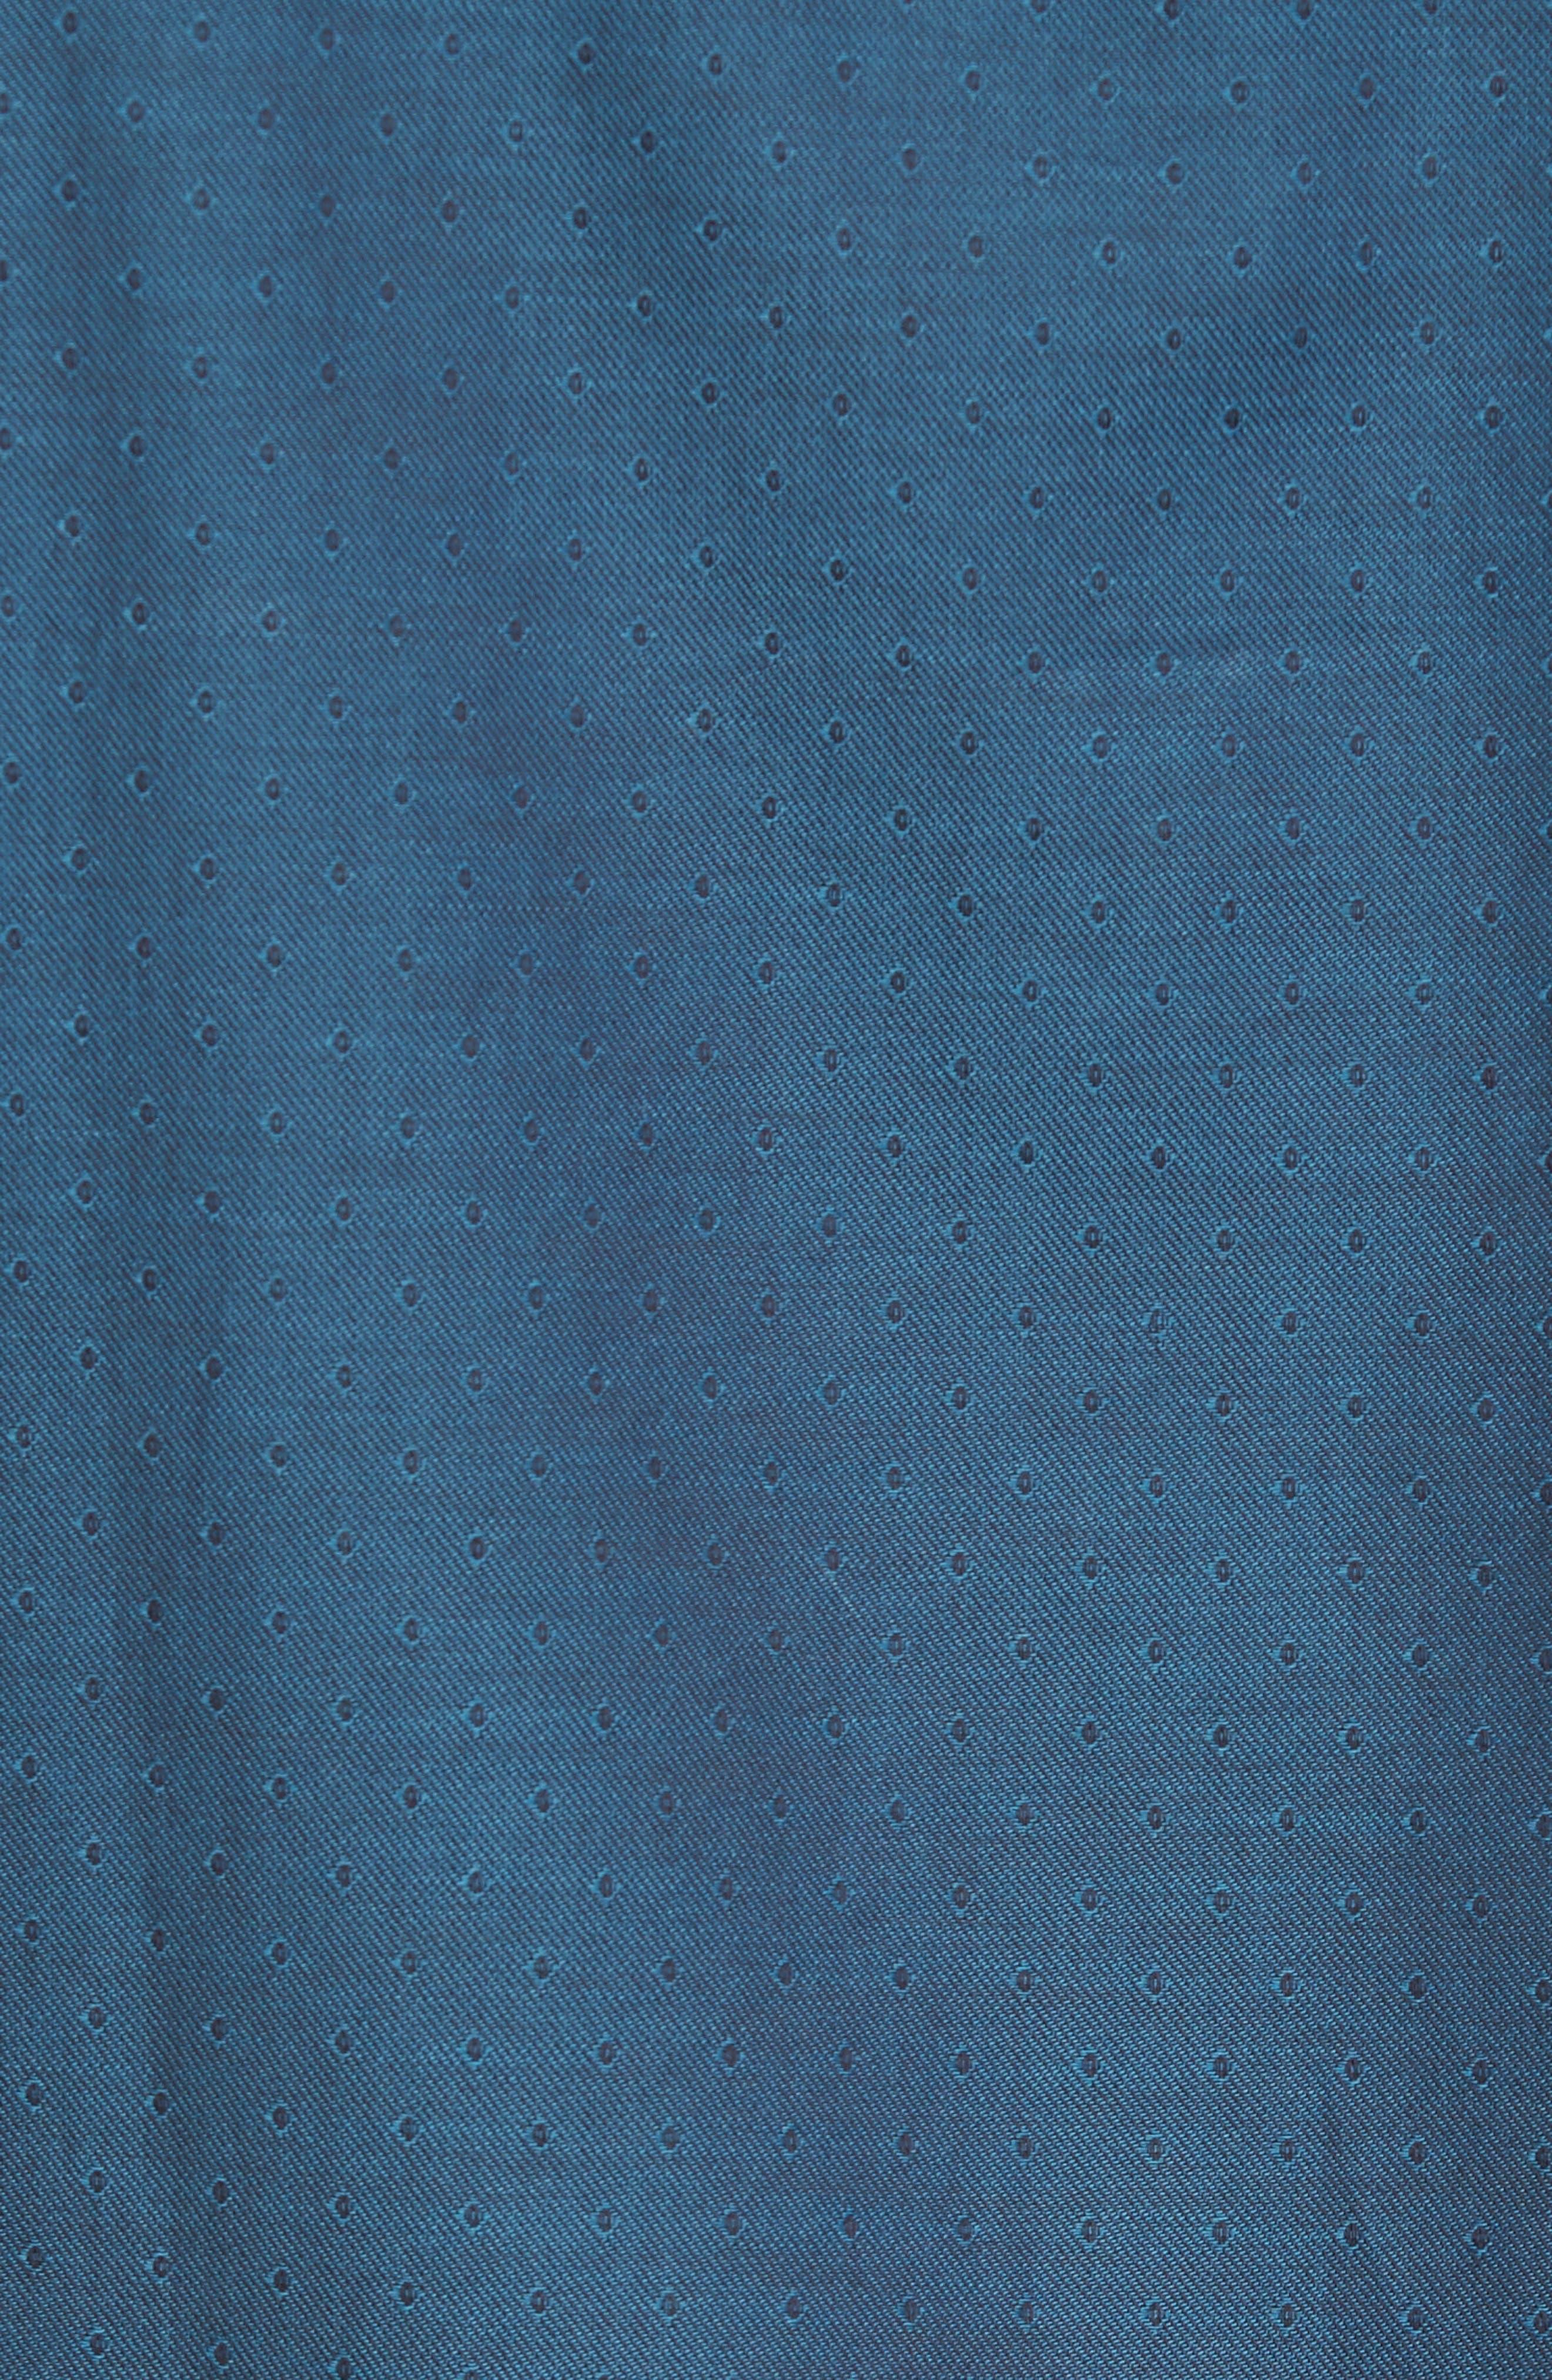 Slim Fit Diamond Twill Sport Shirt,                             Alternate thumbnail 5, color,                             TEAL